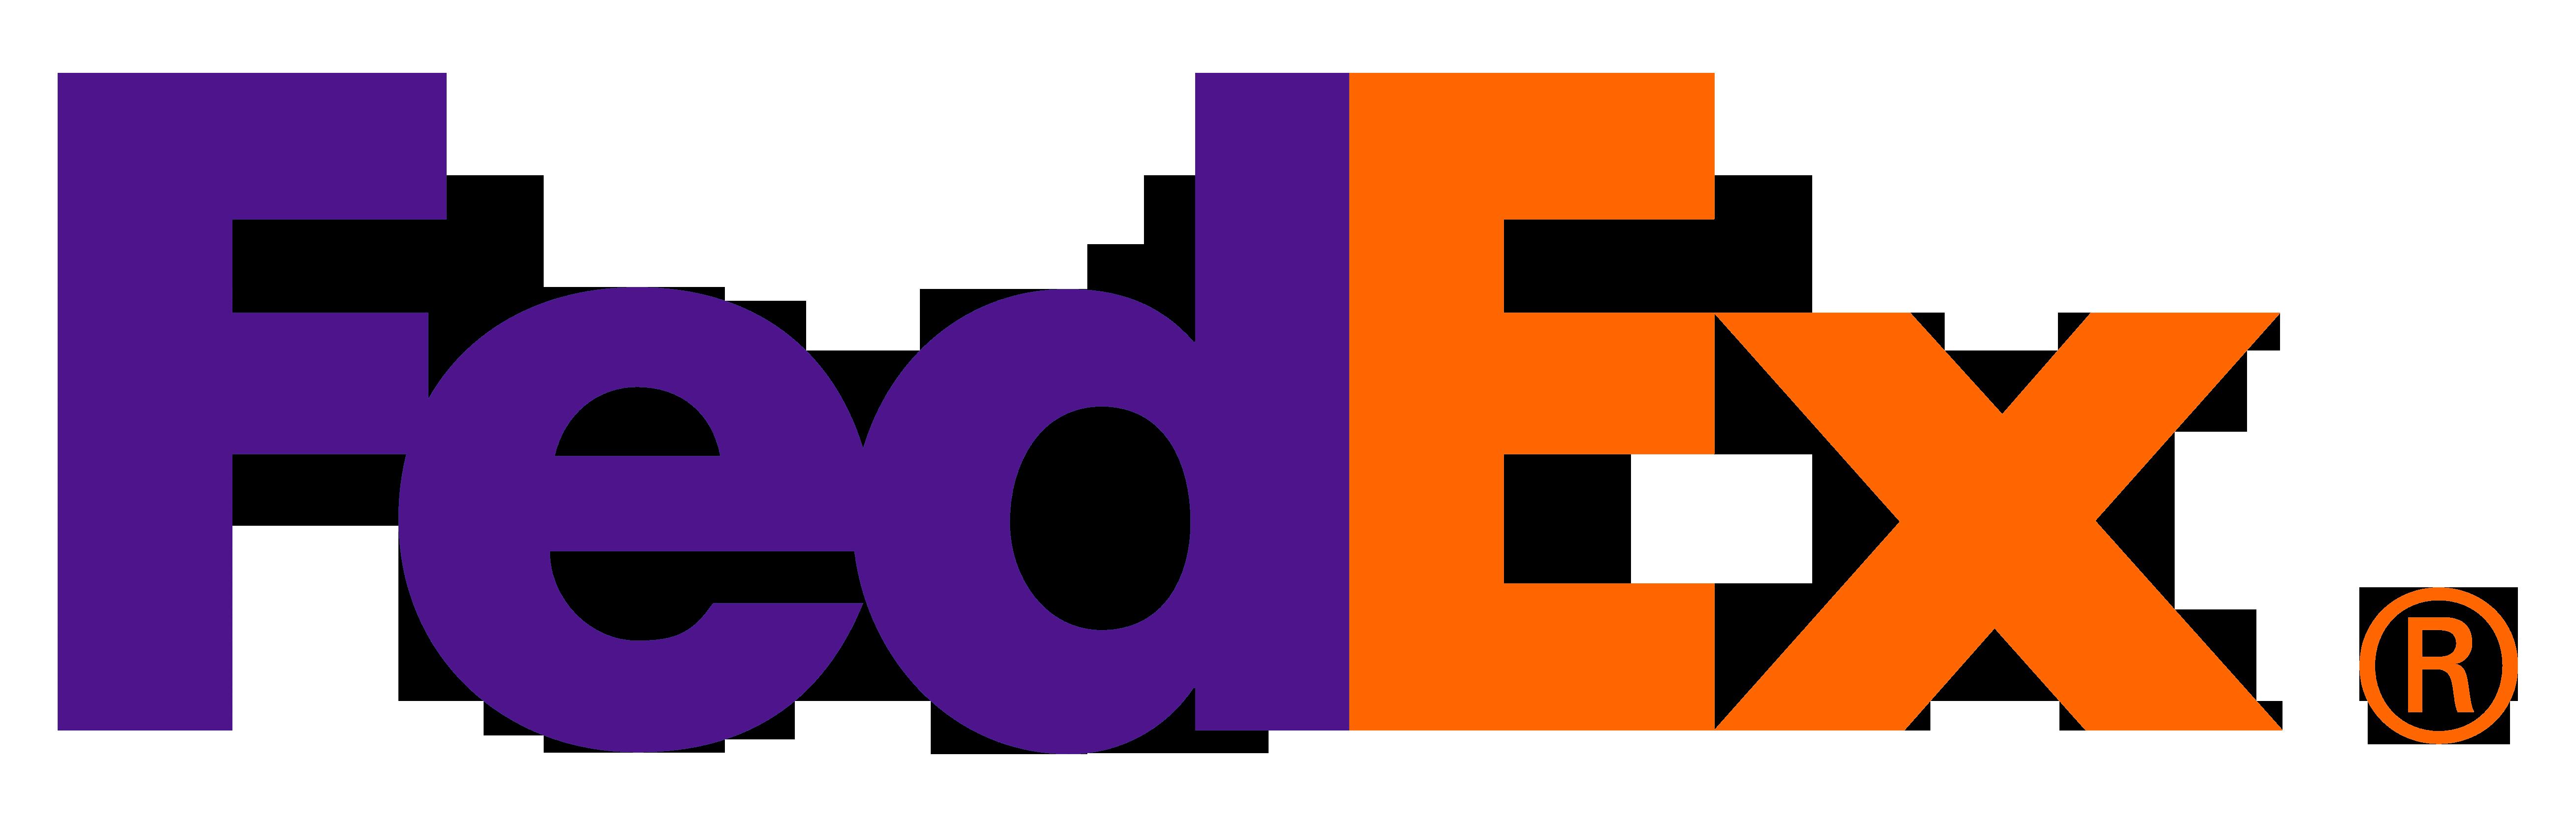 Mcdonalds clipart high resolution. Fedex logo png image